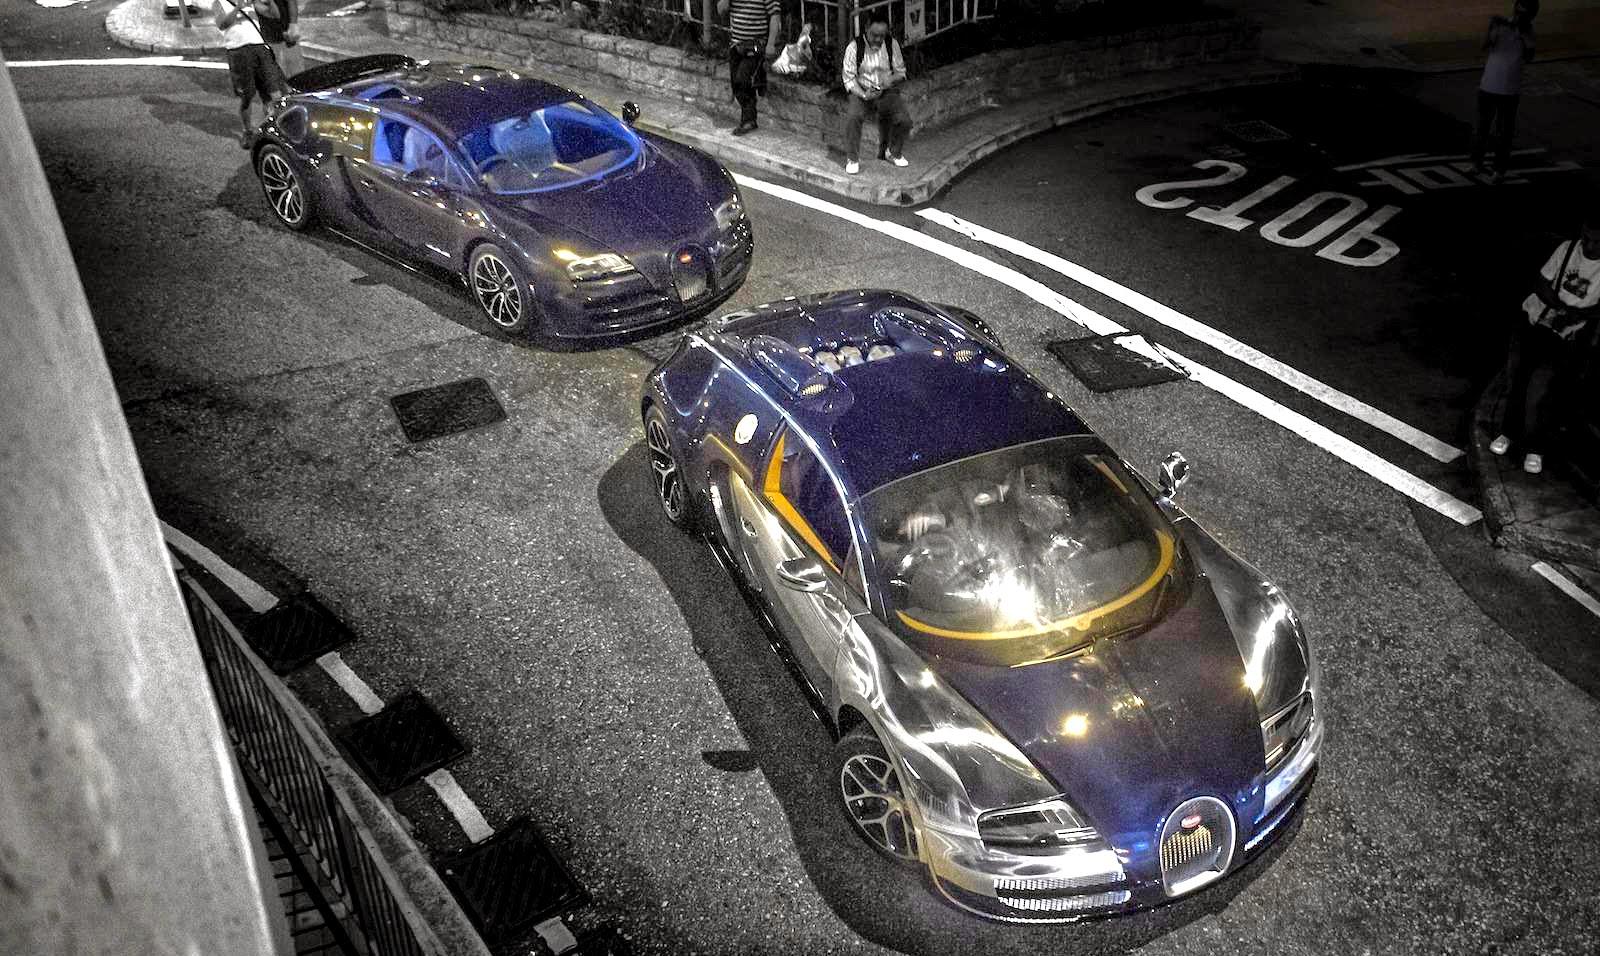 New Bugatti Veyron Super Sport Merveilleux Edition